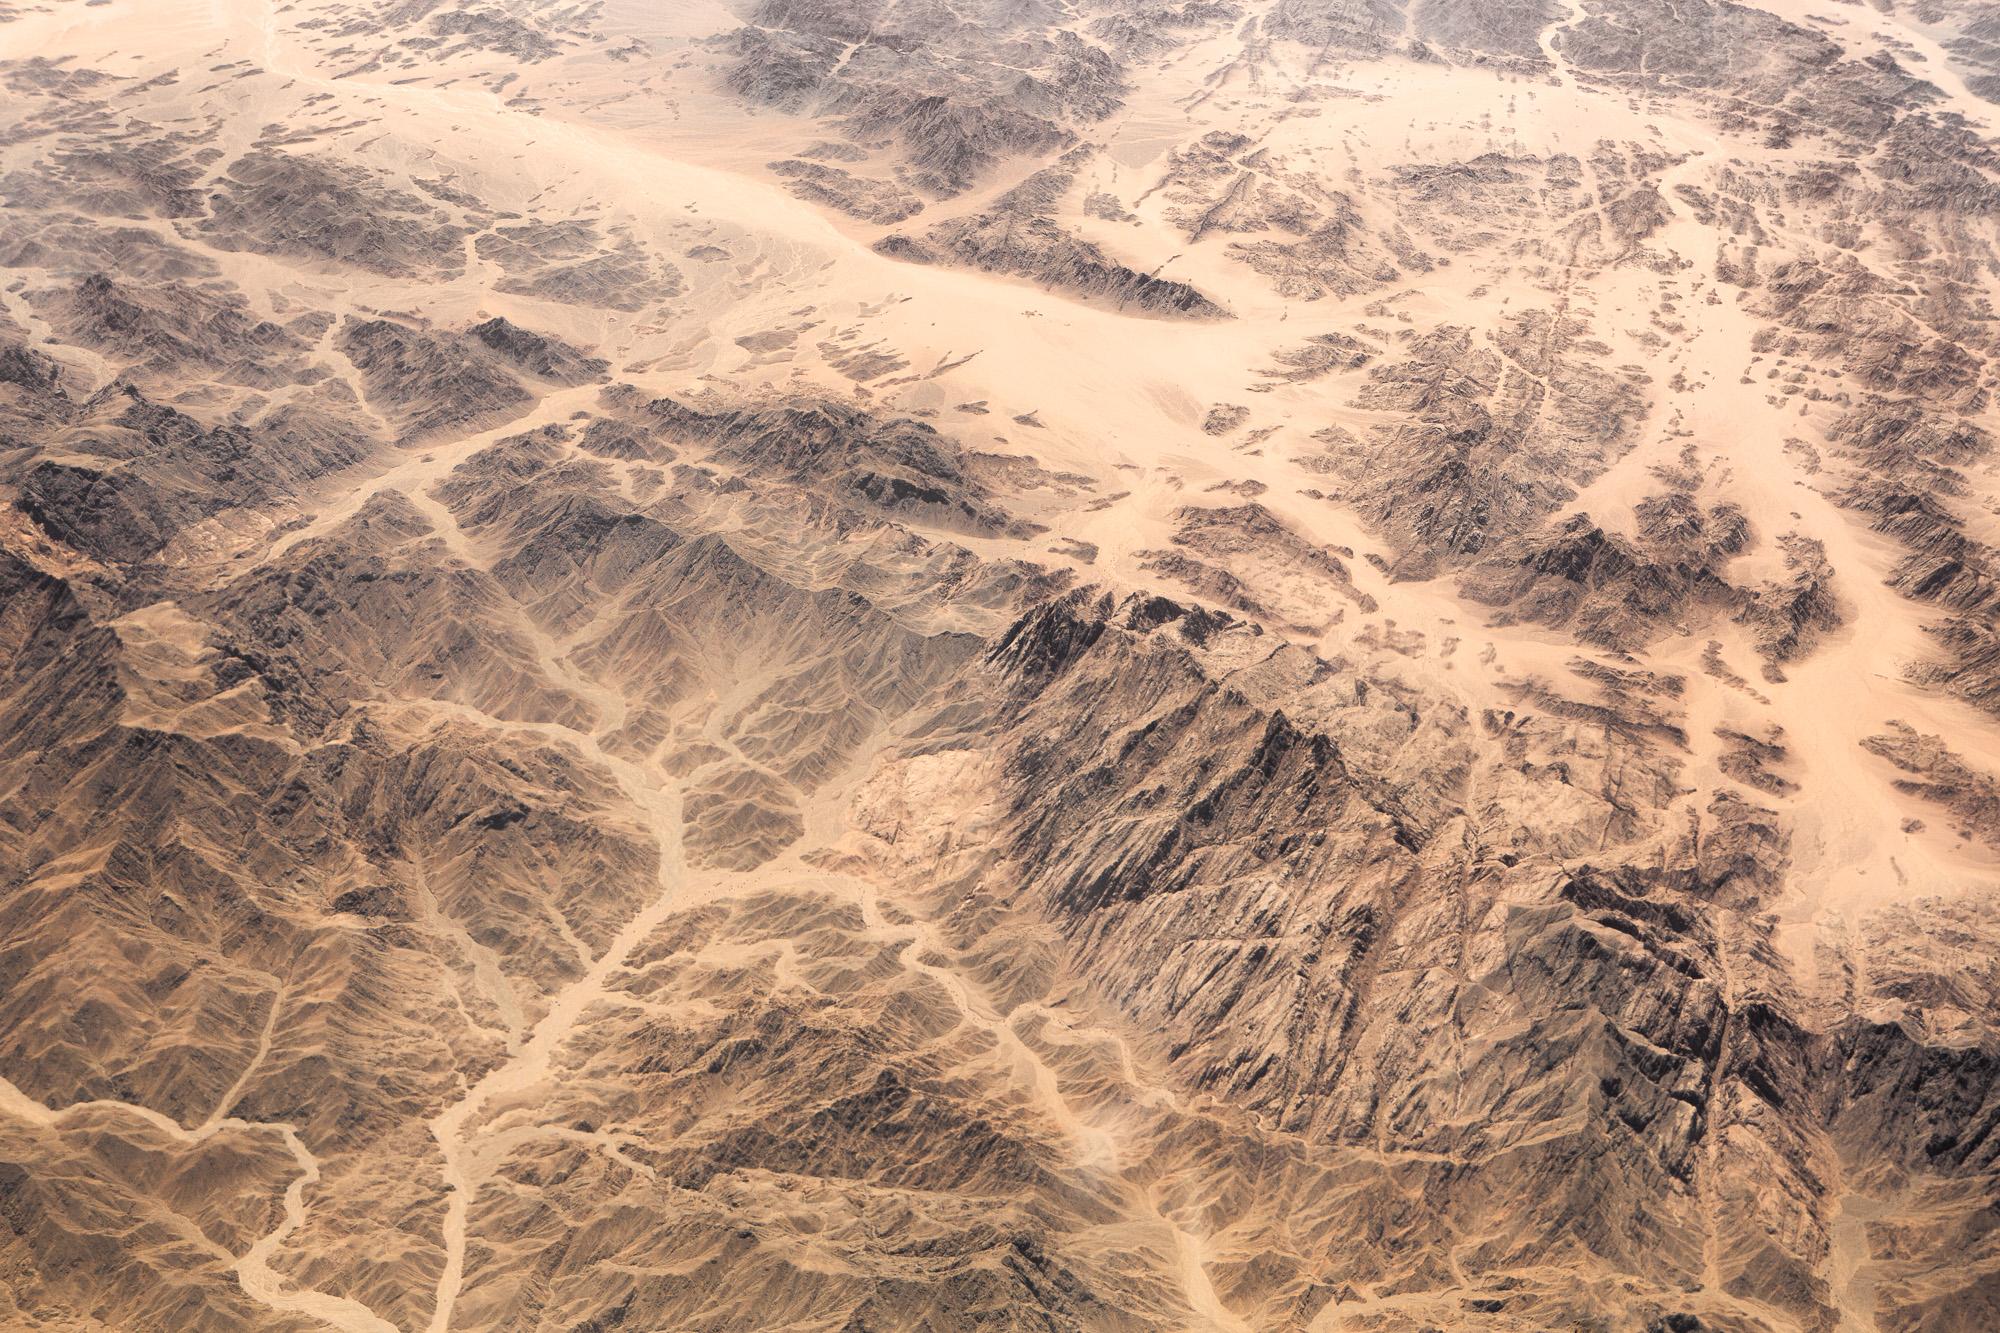 Deserts - Survey #5, 2015